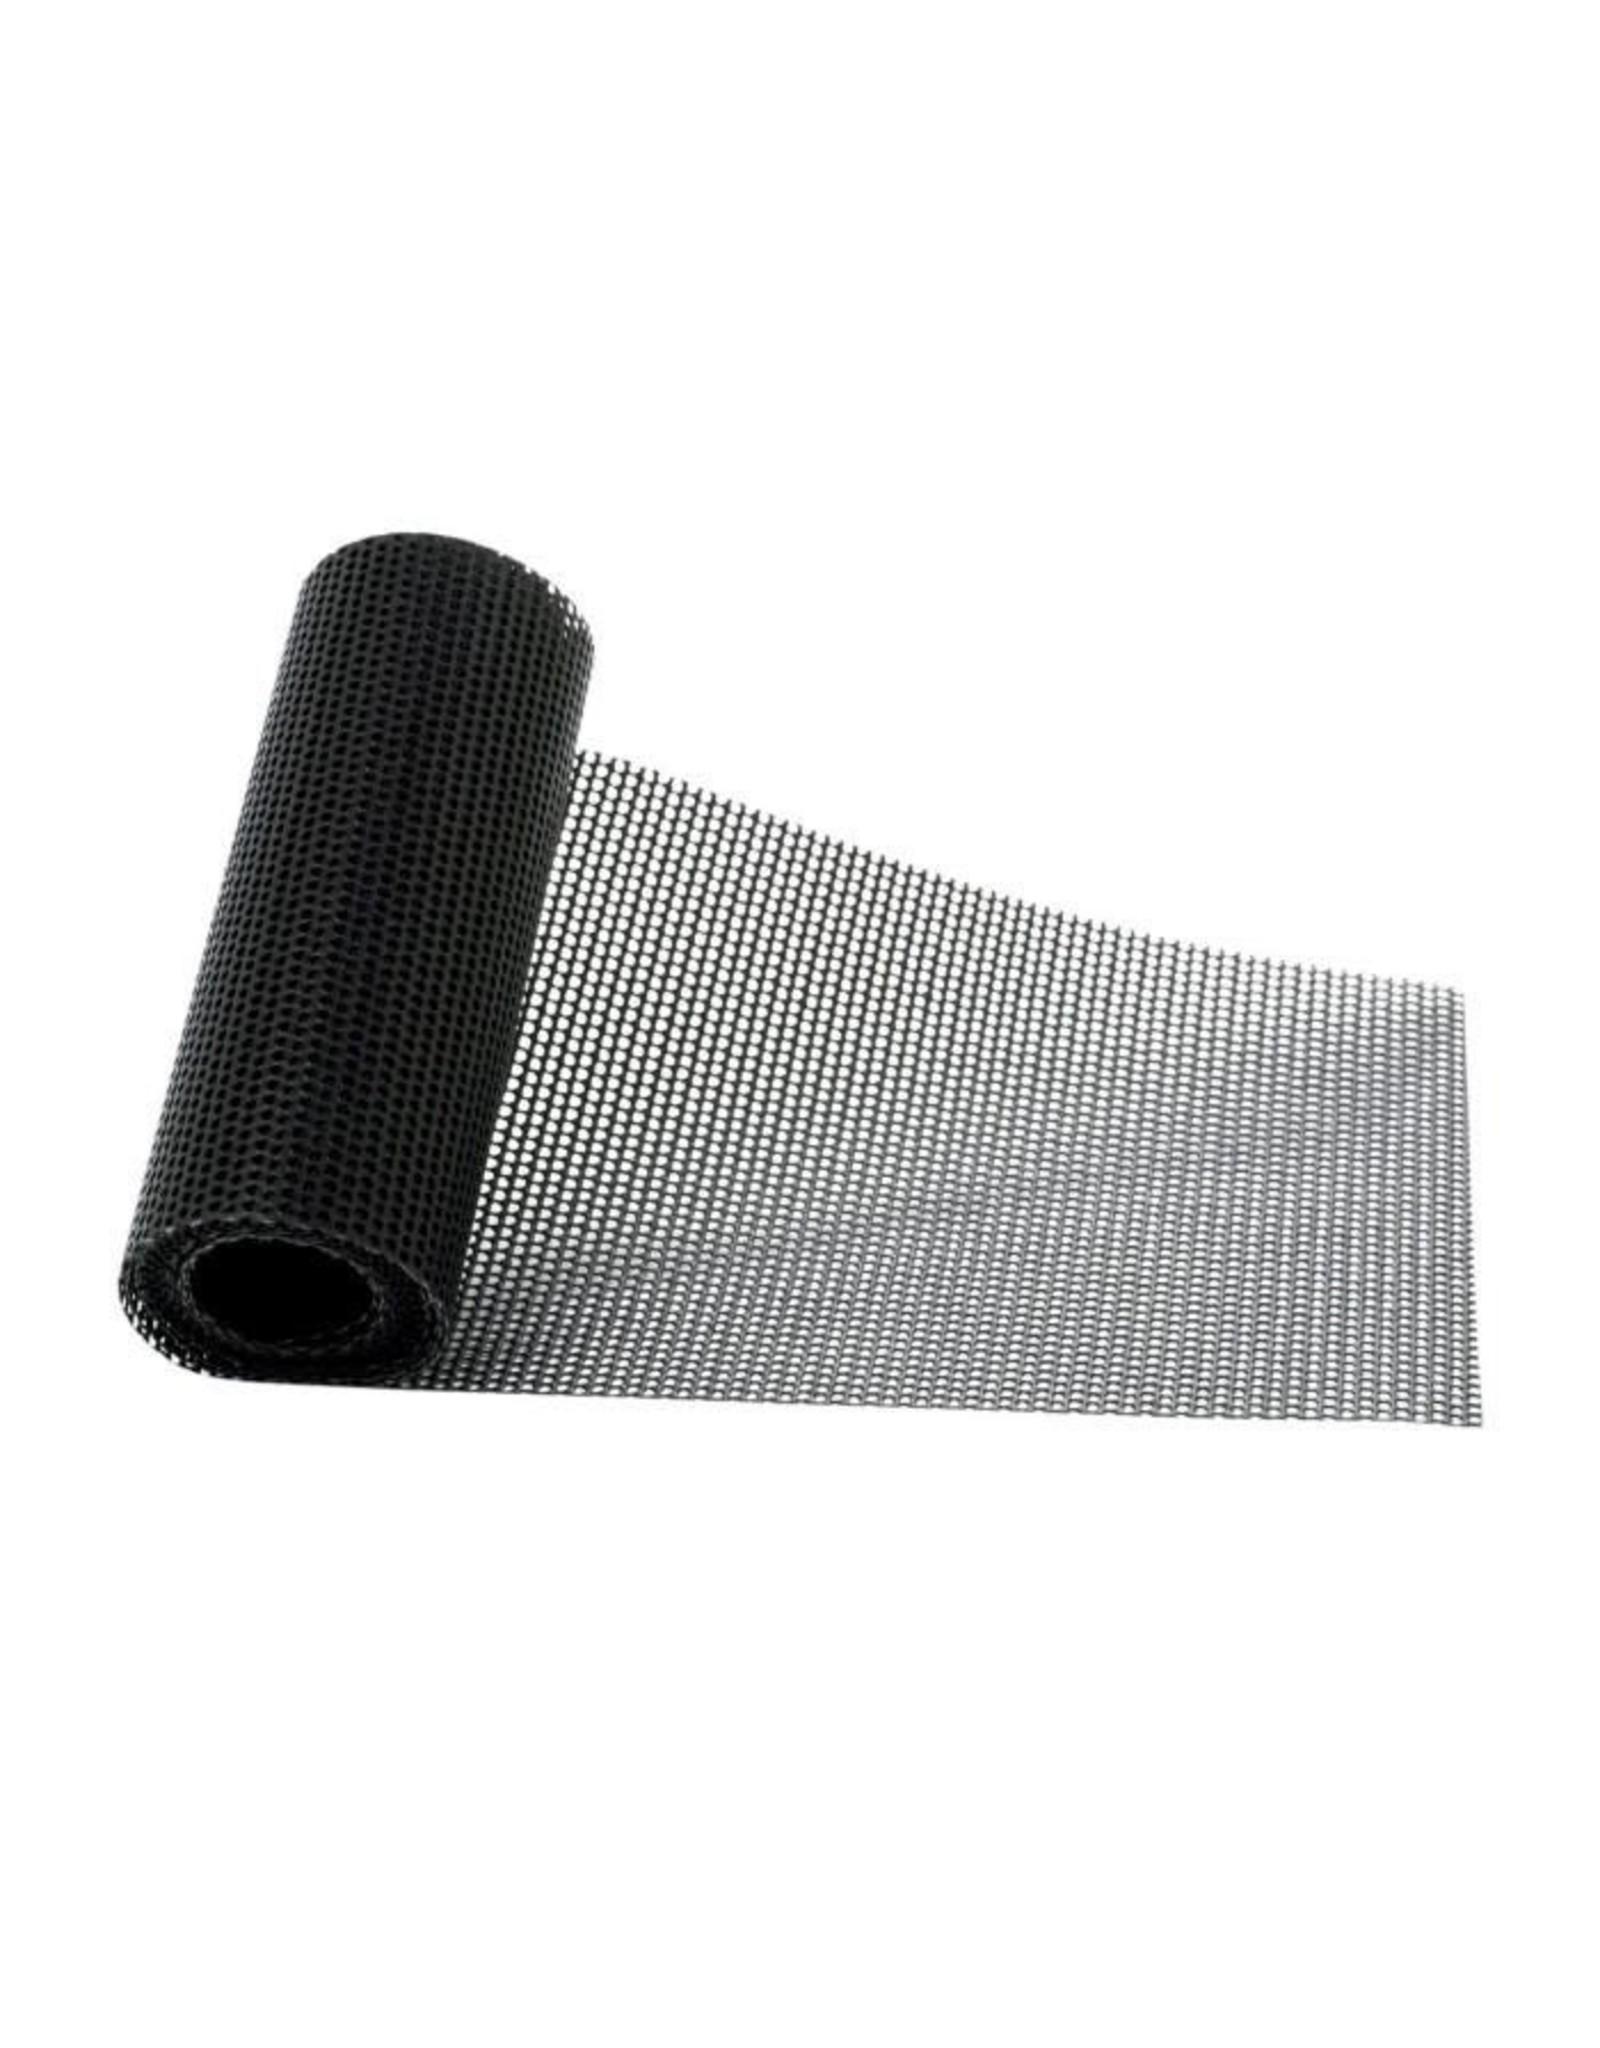 Black Diamond Black Diamond Cheat Sheets